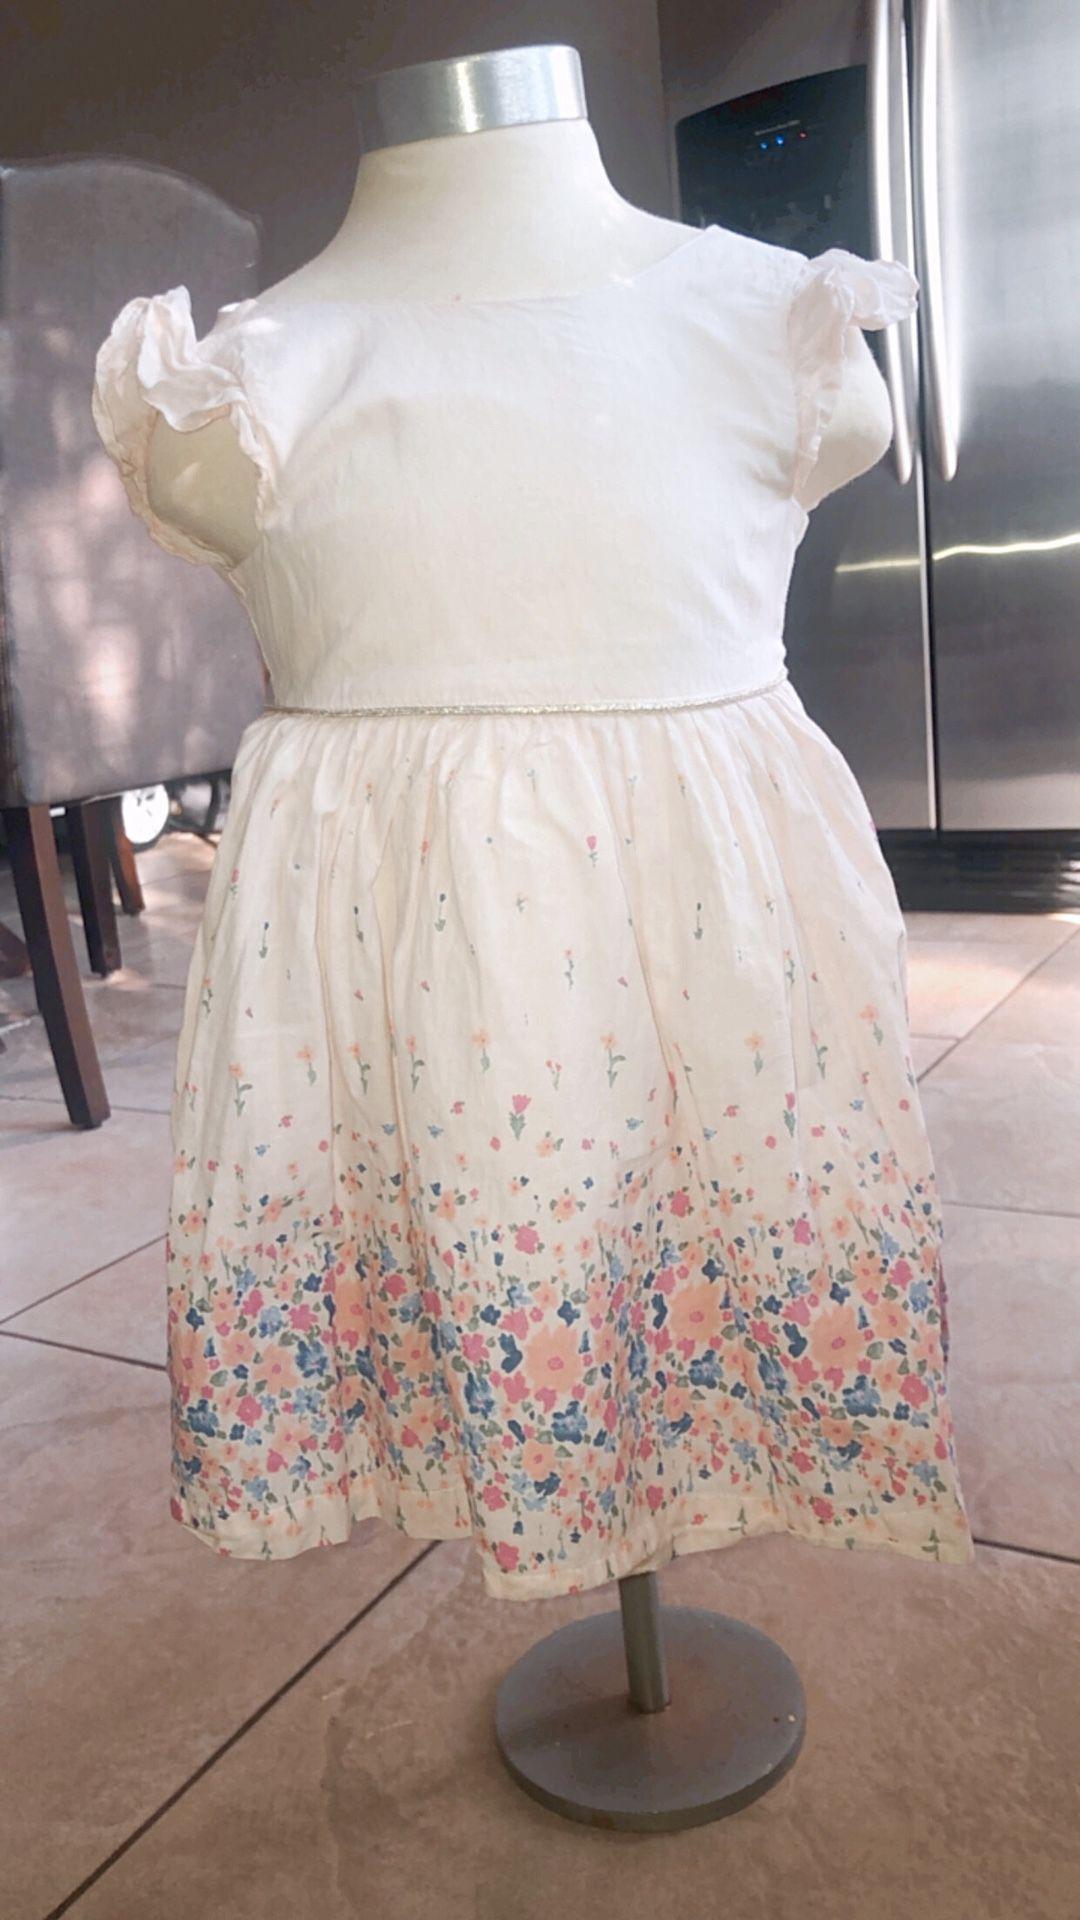 Toddler girl oshkosh dress 2t